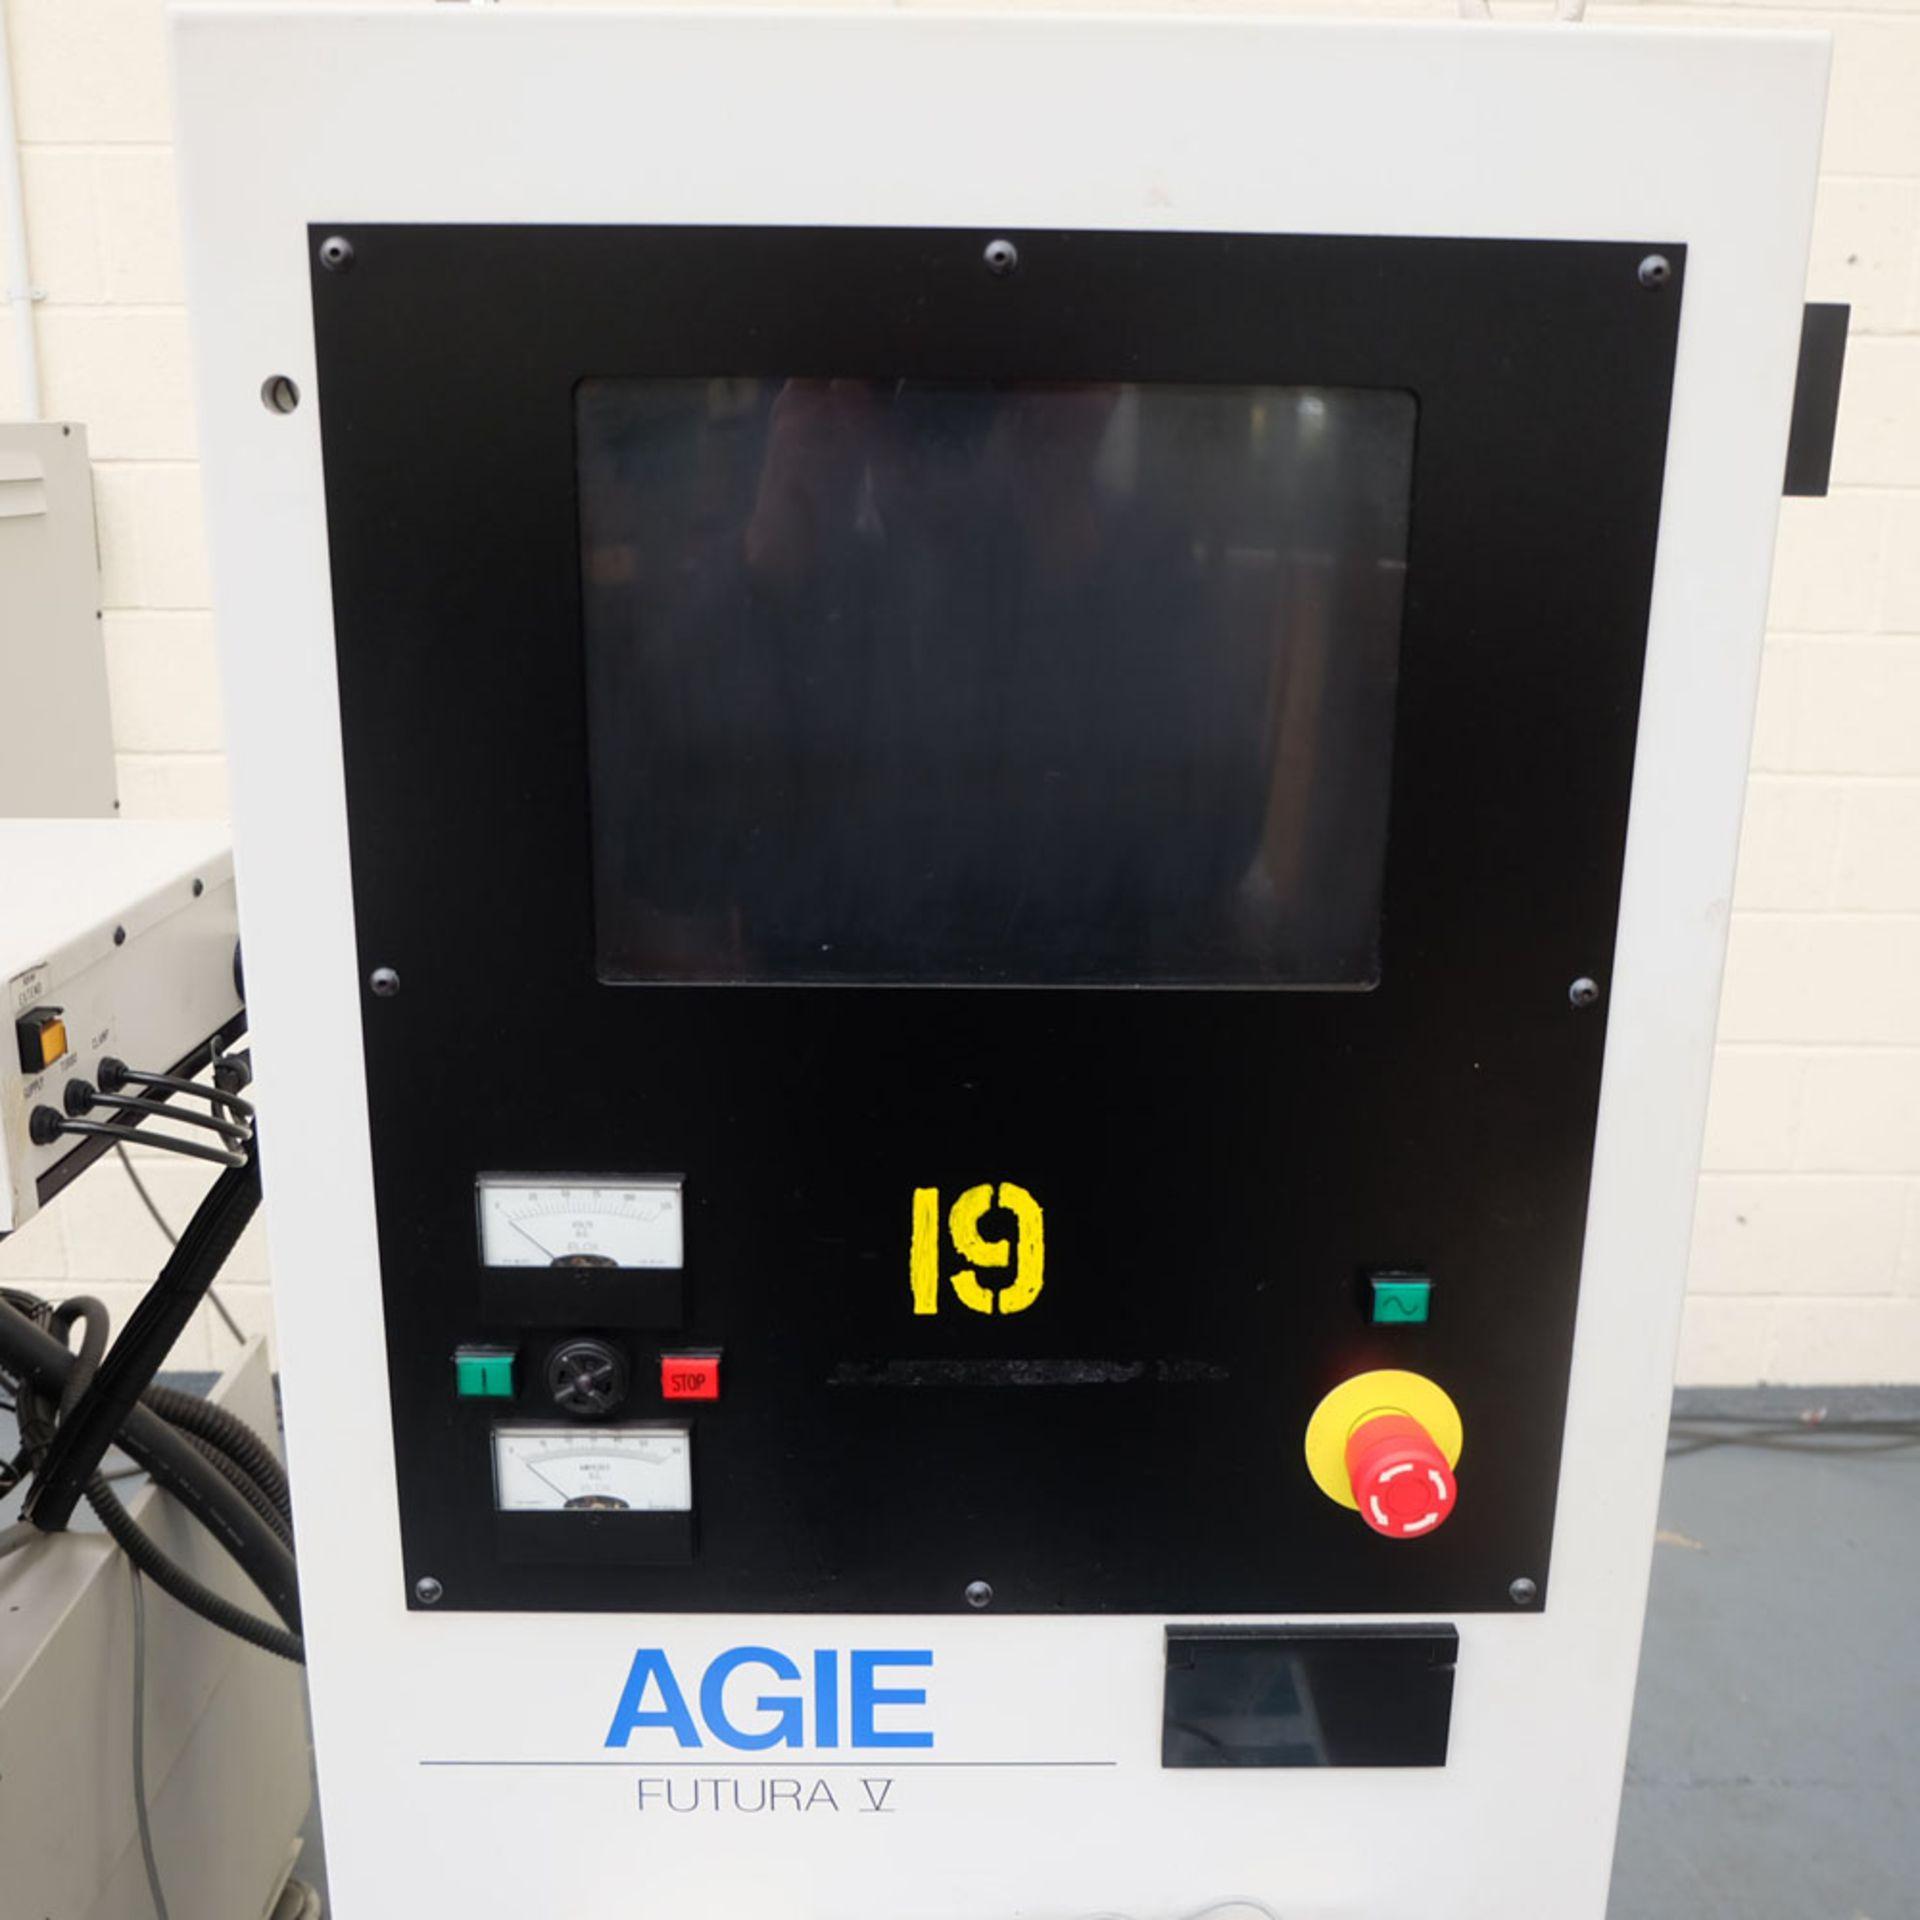 AGIE Mondo Star 20. EDM/Die Sinking Machine With Agie Futura V 1PM Control. - Image 13 of 16